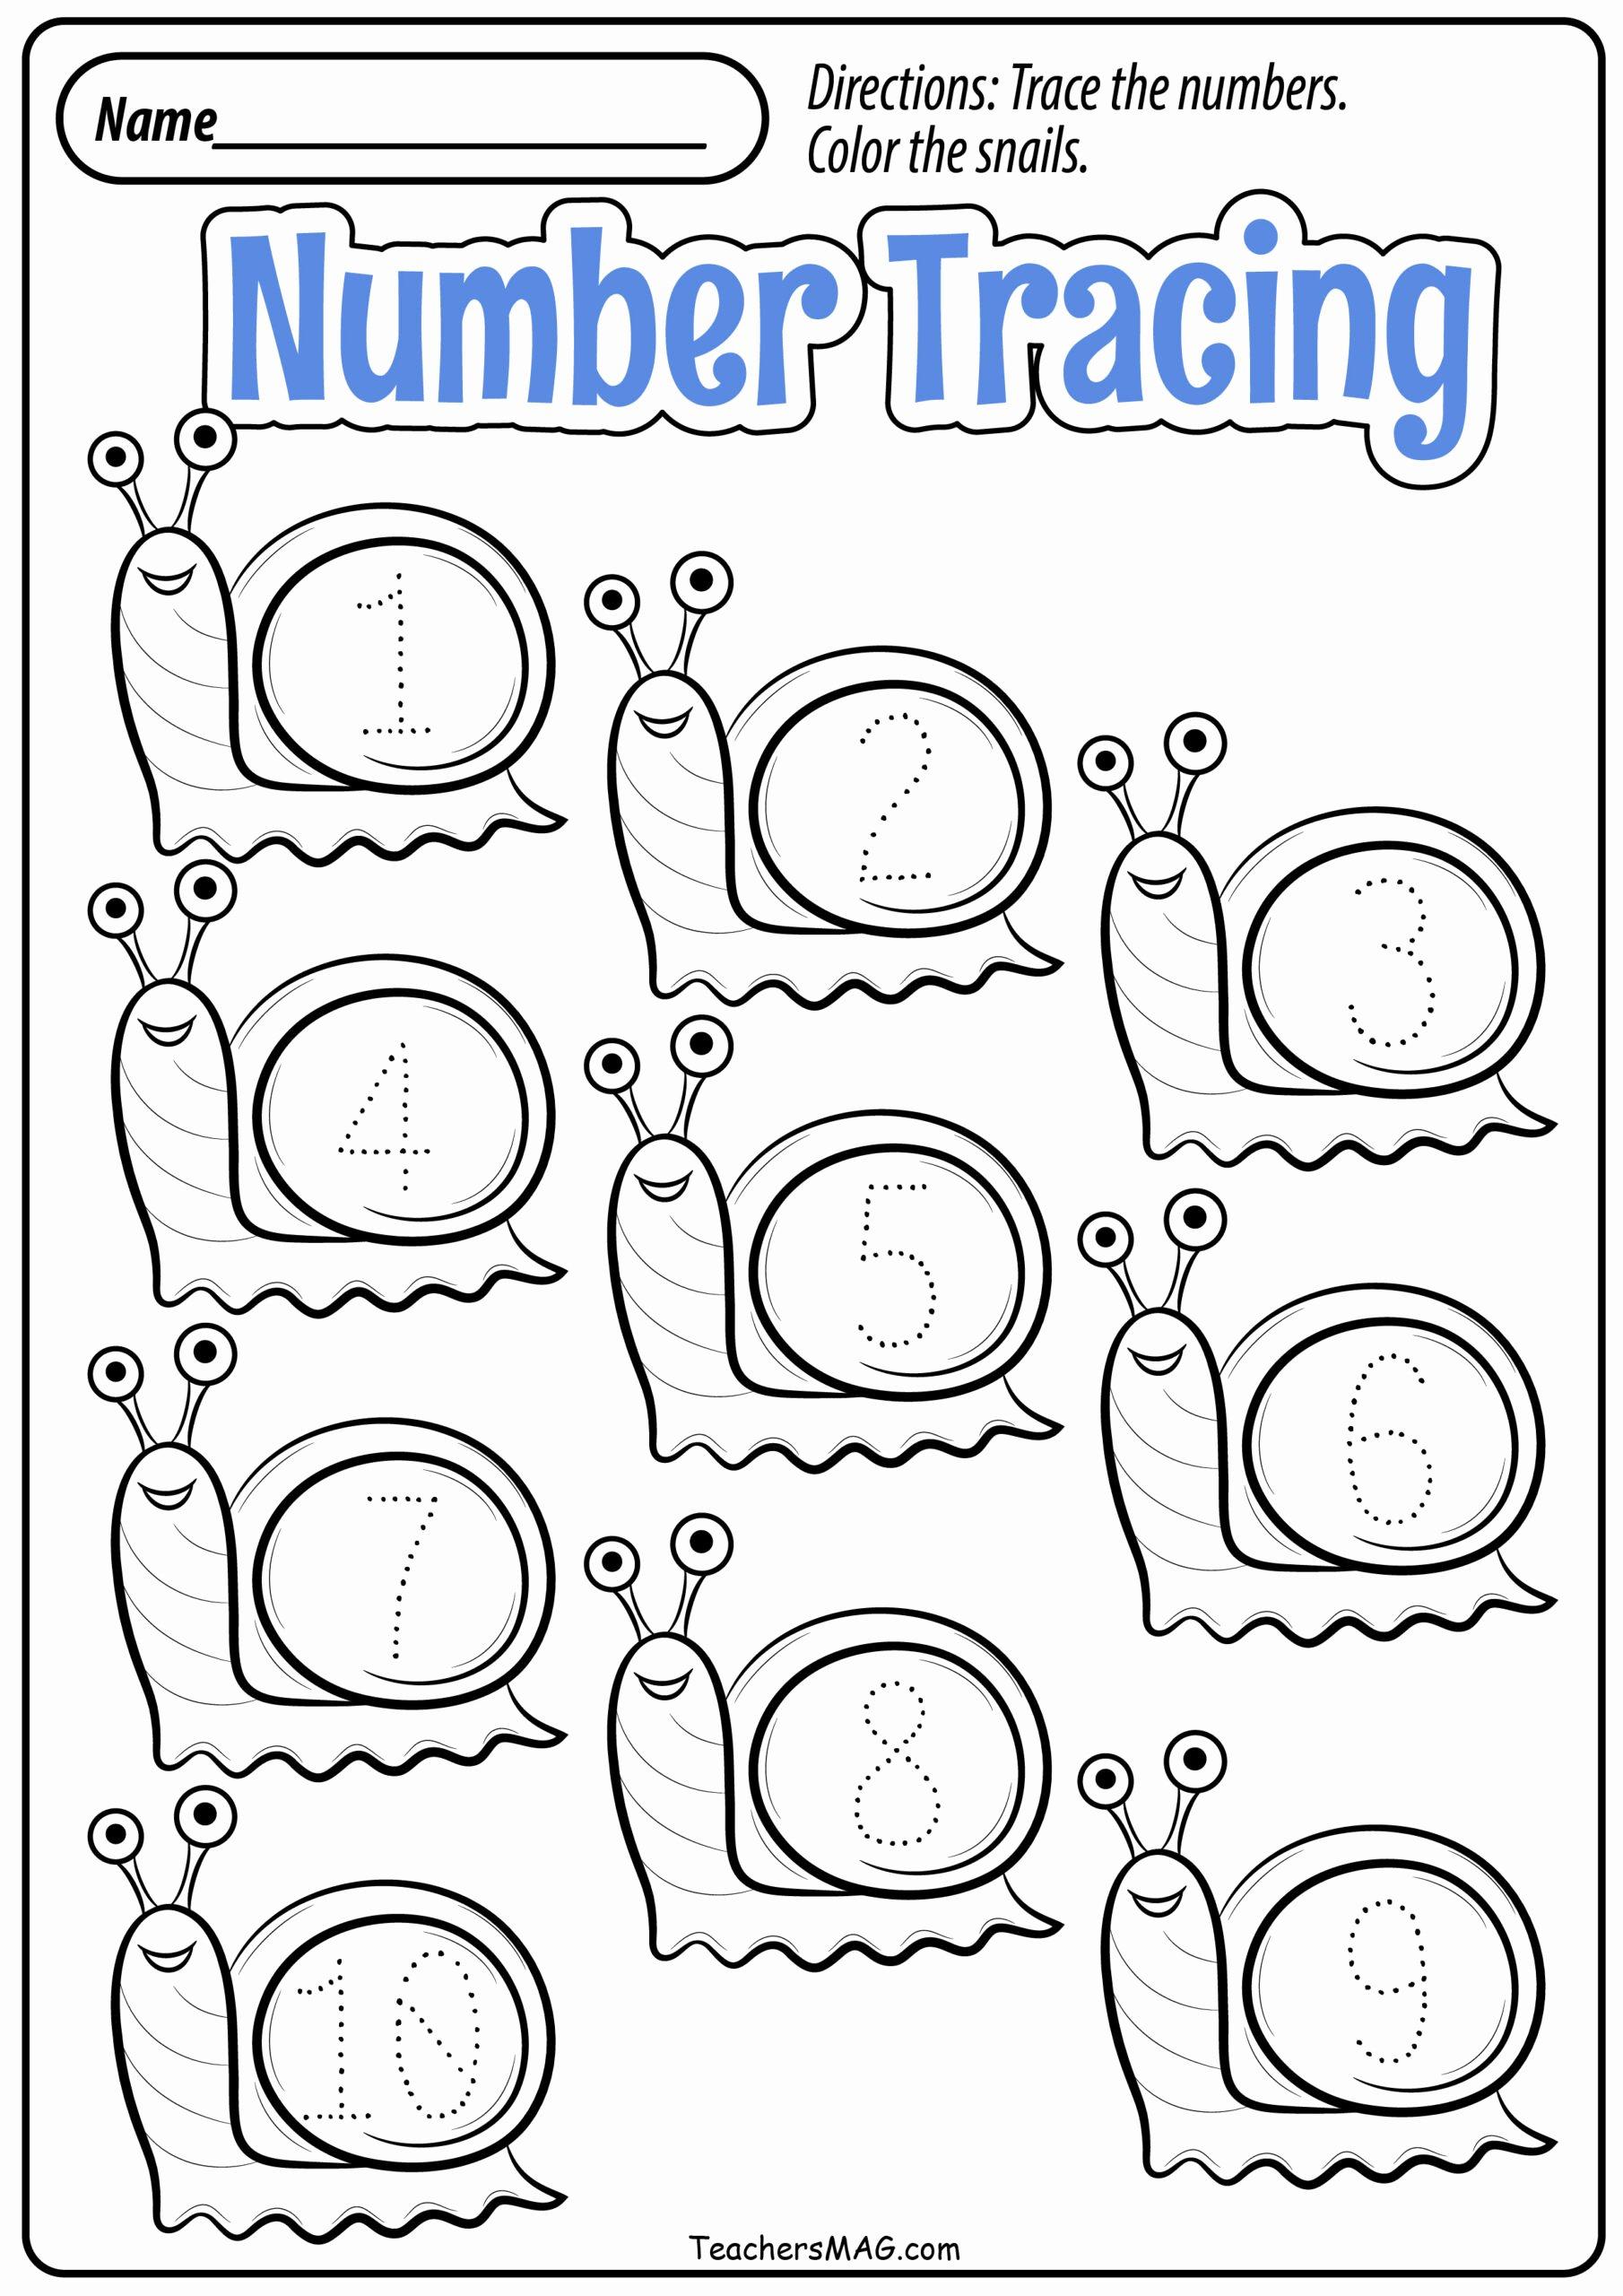 Math Worksheets for Preschoolers New Worksheets Preschool Fall Math Worksheets Teachersmag Free